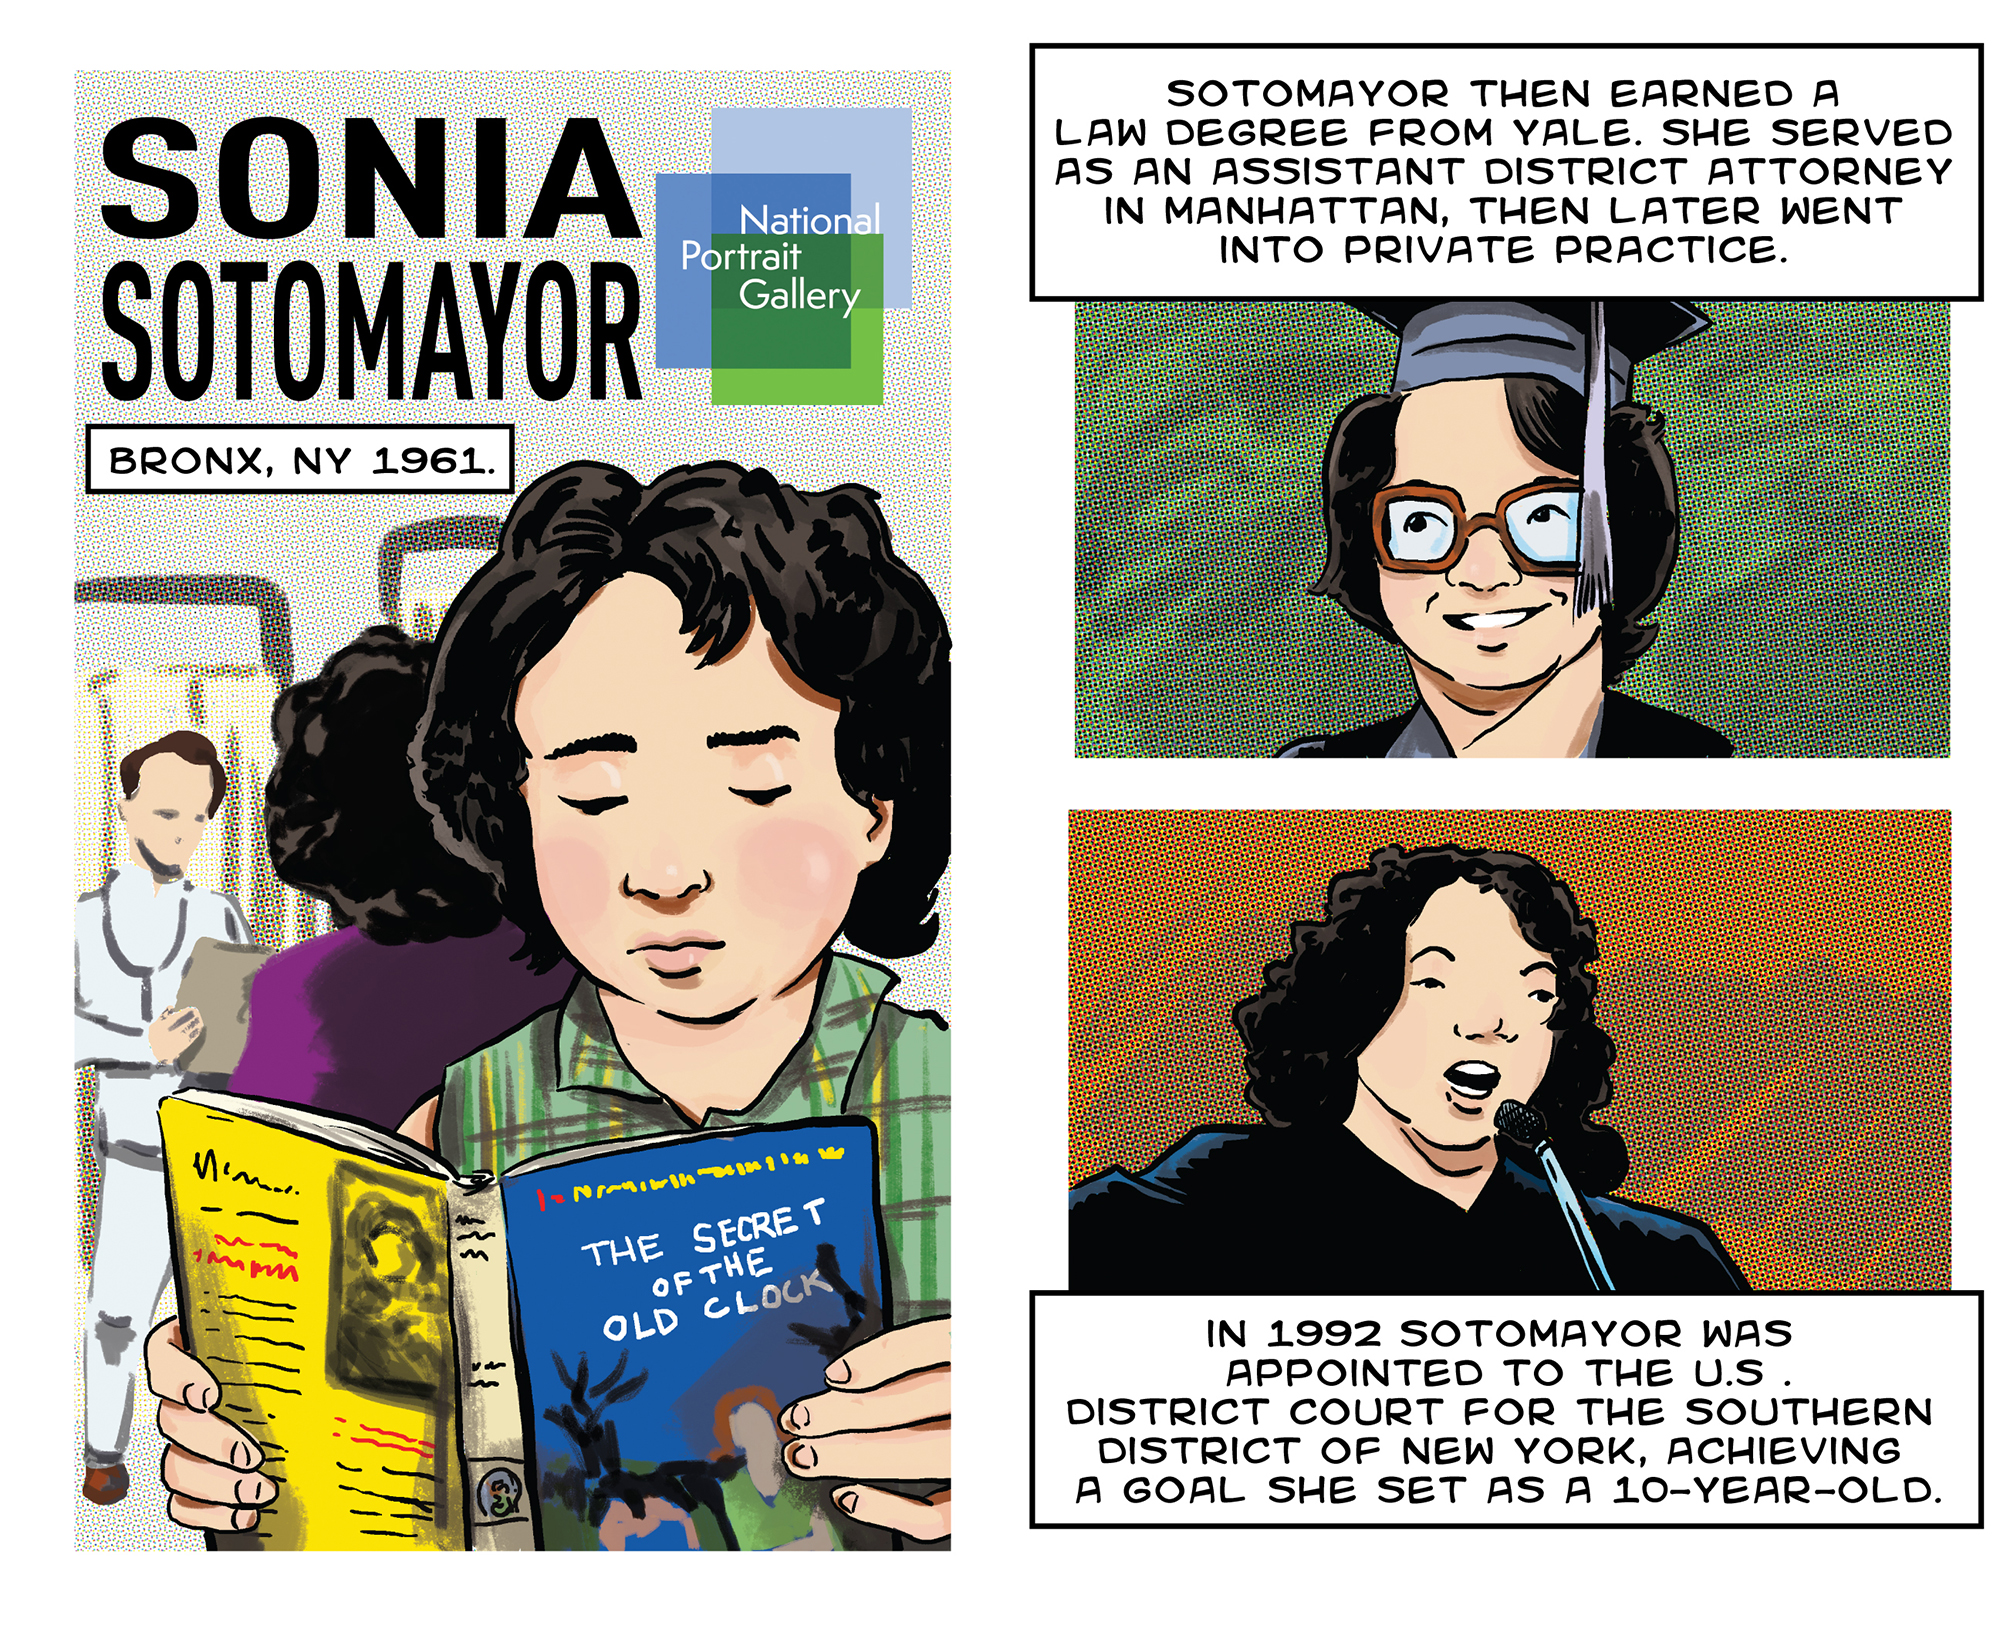 Keeling/ Sonia Sotomayor